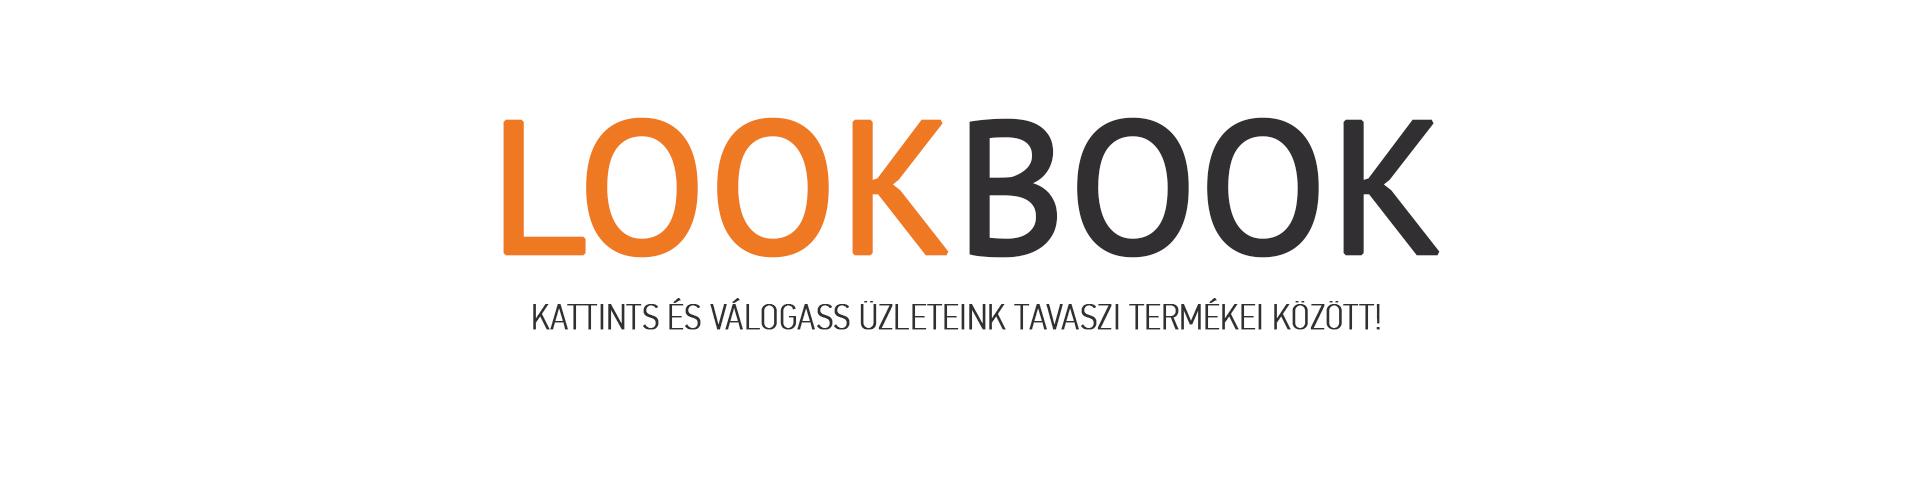 lookbook-tavasz